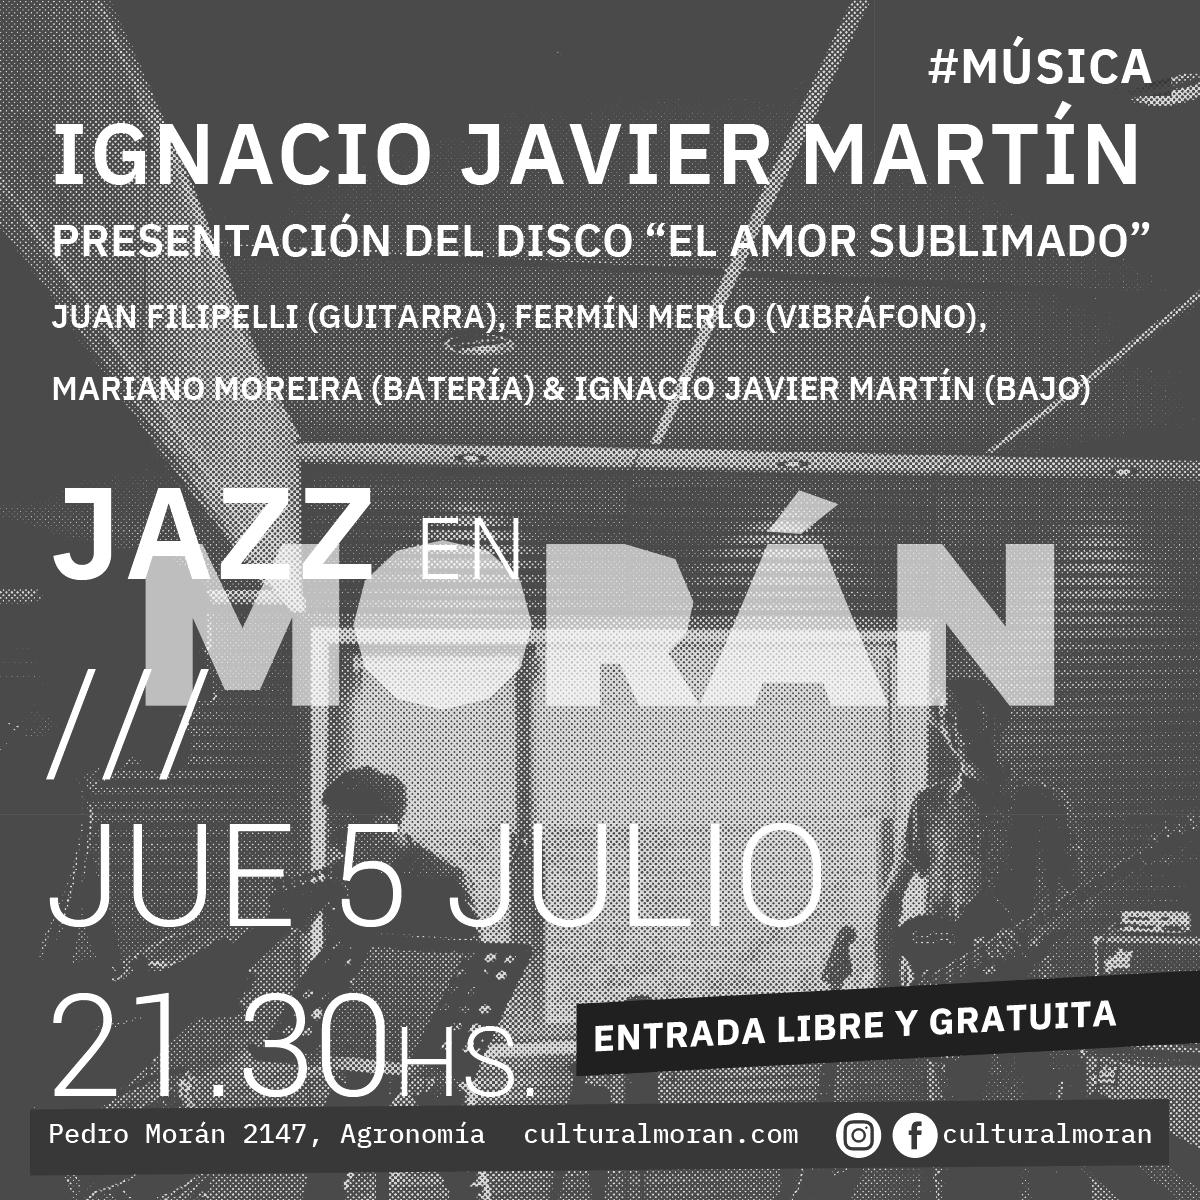 180705_MORA�N - Jazz en Mora�n_Redes-Flyer.png